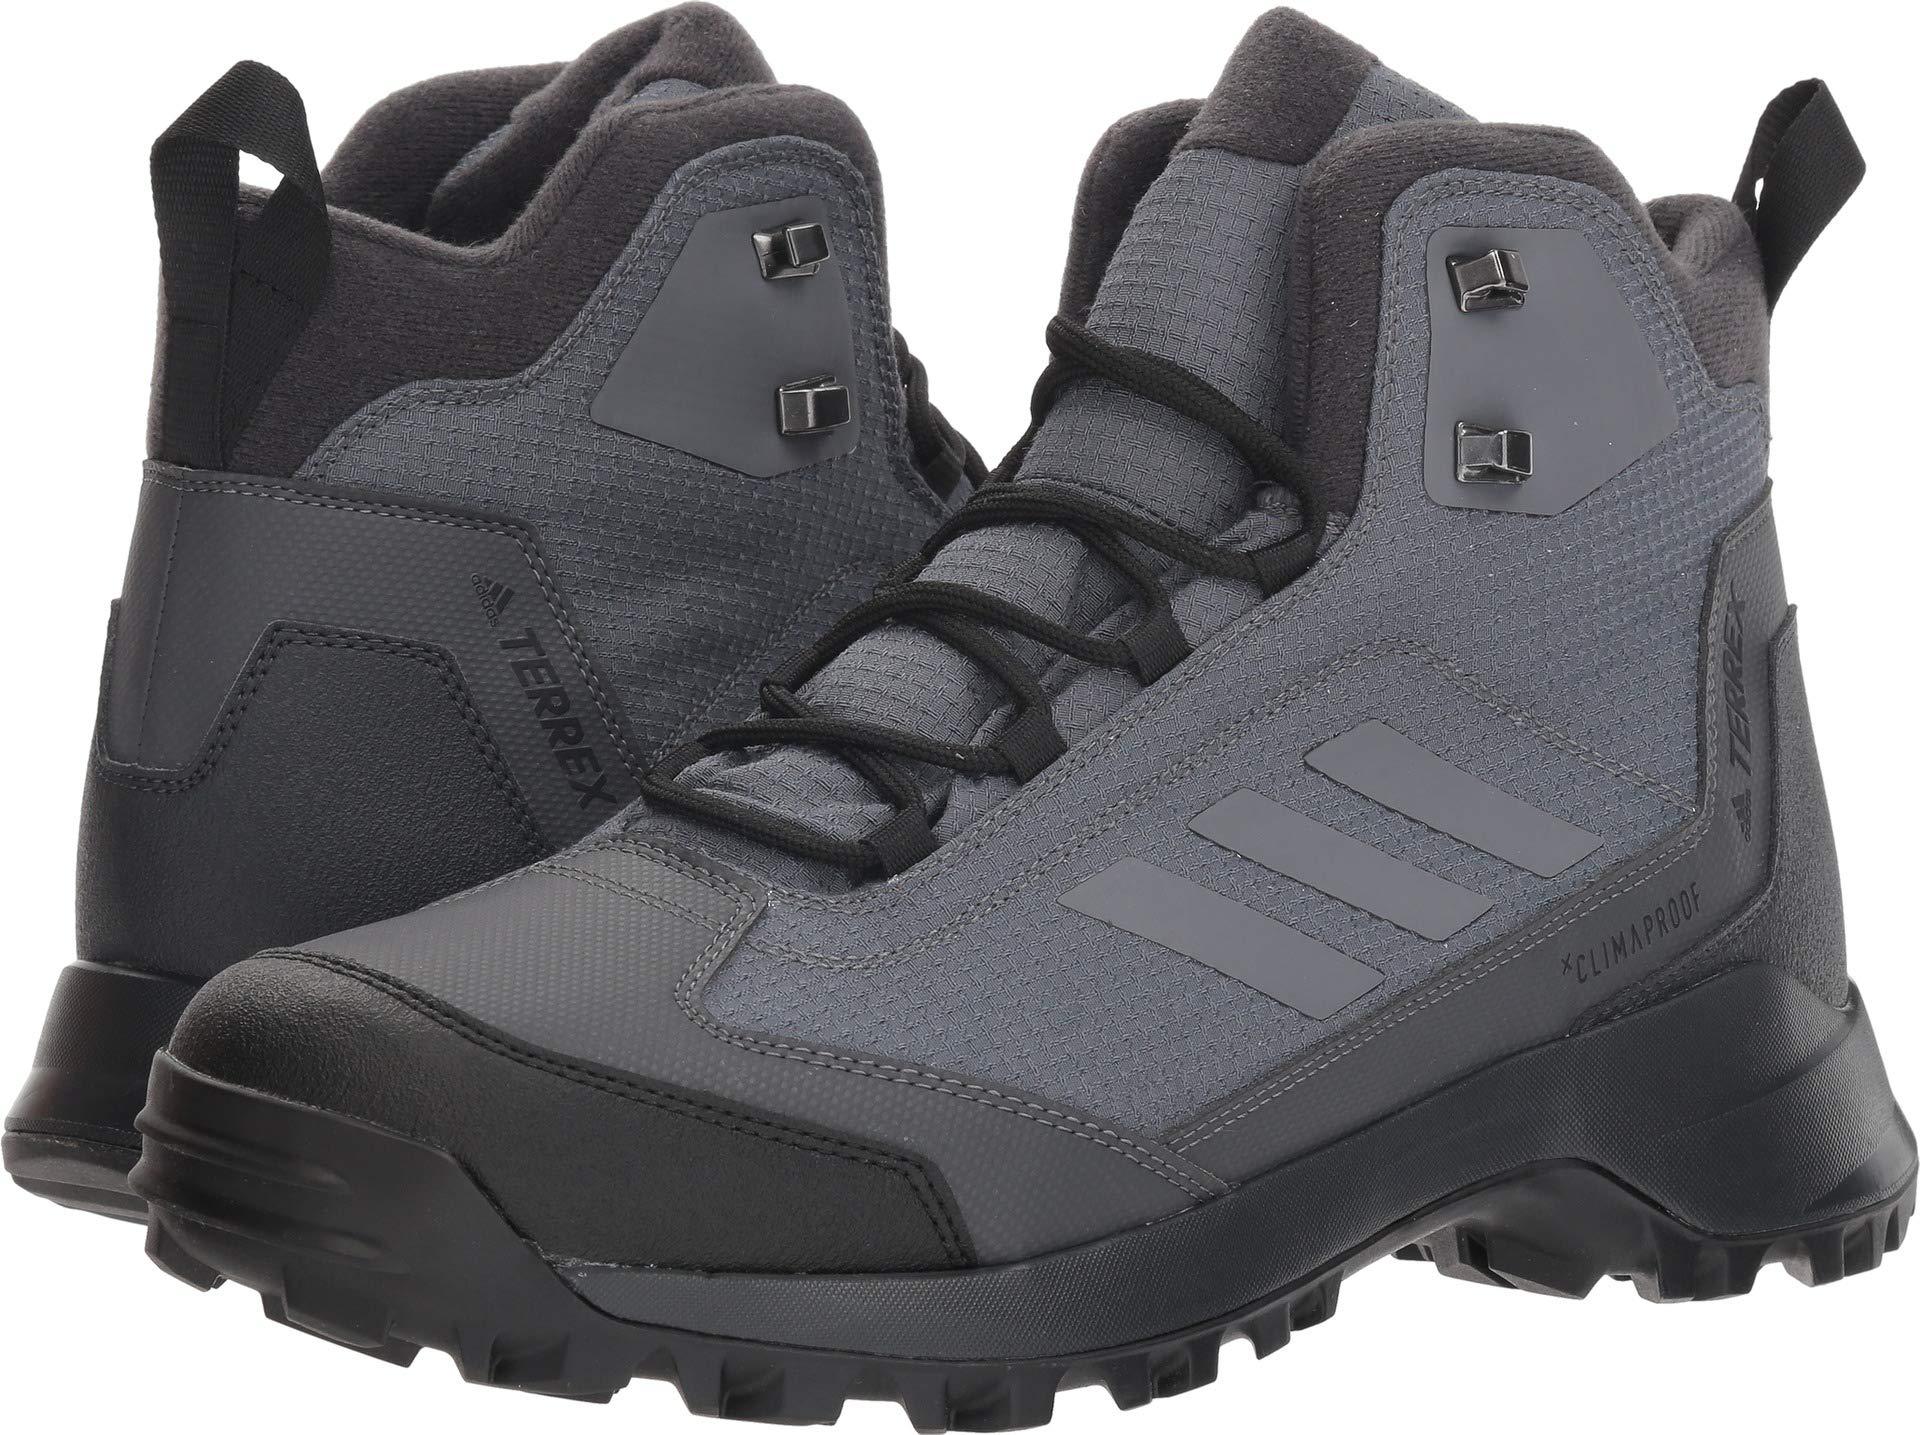 15e5764b50c adidas outdoor Men's Terrex Heron MID CW CP, Grey Five/Carbon, 6 D US